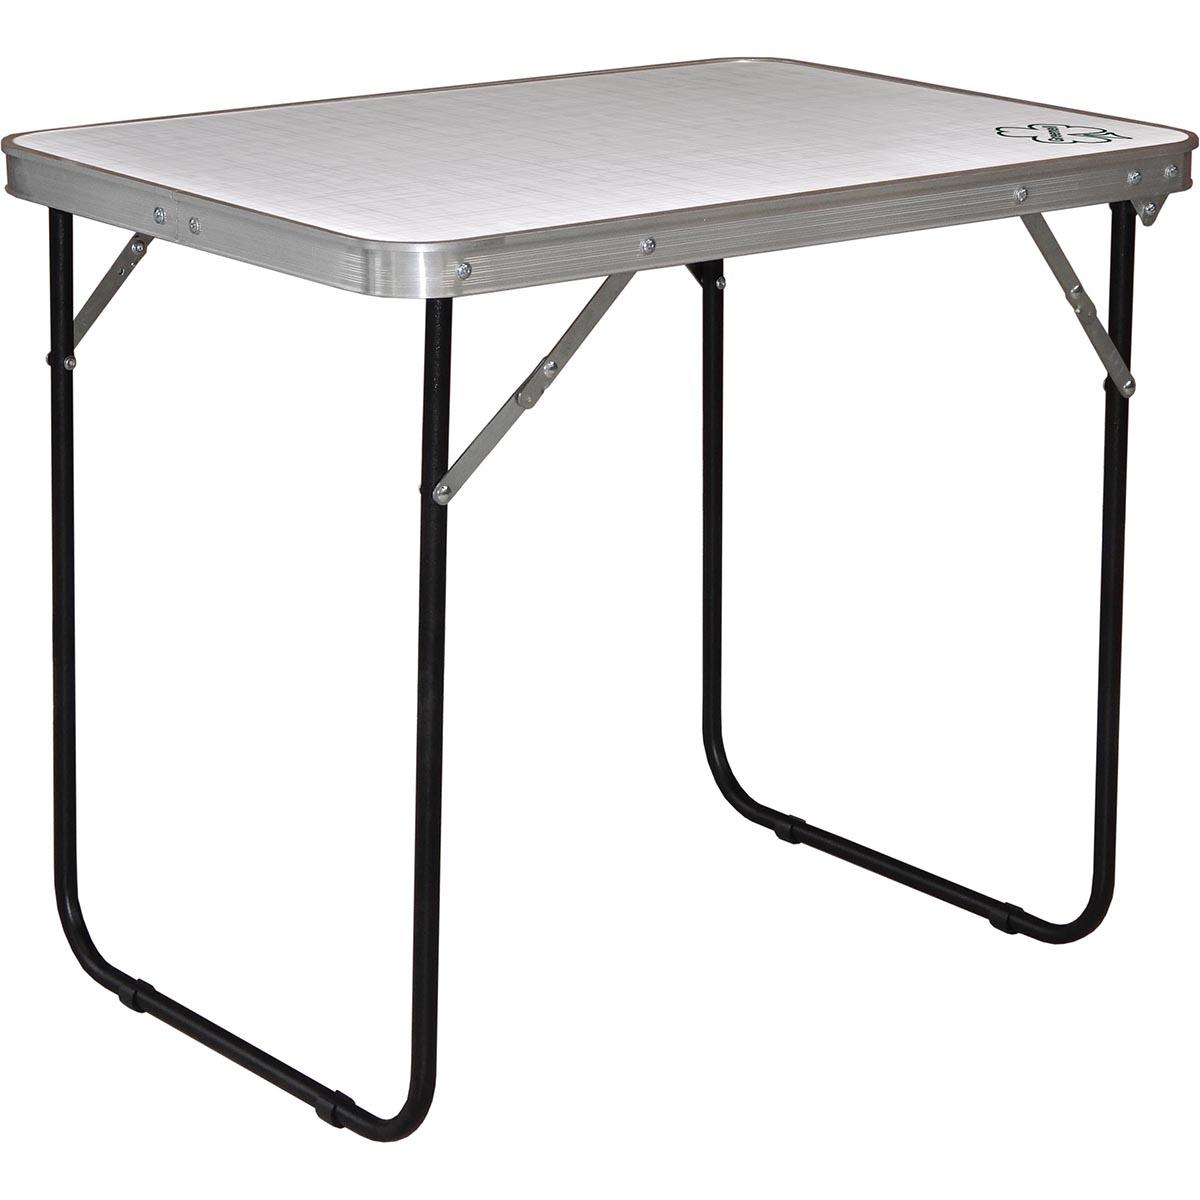 Стол складной Greenell FT-12 R16 WR, цвет: стальной, 50 х 70 х 60 см стол mariott d80 х 74 см